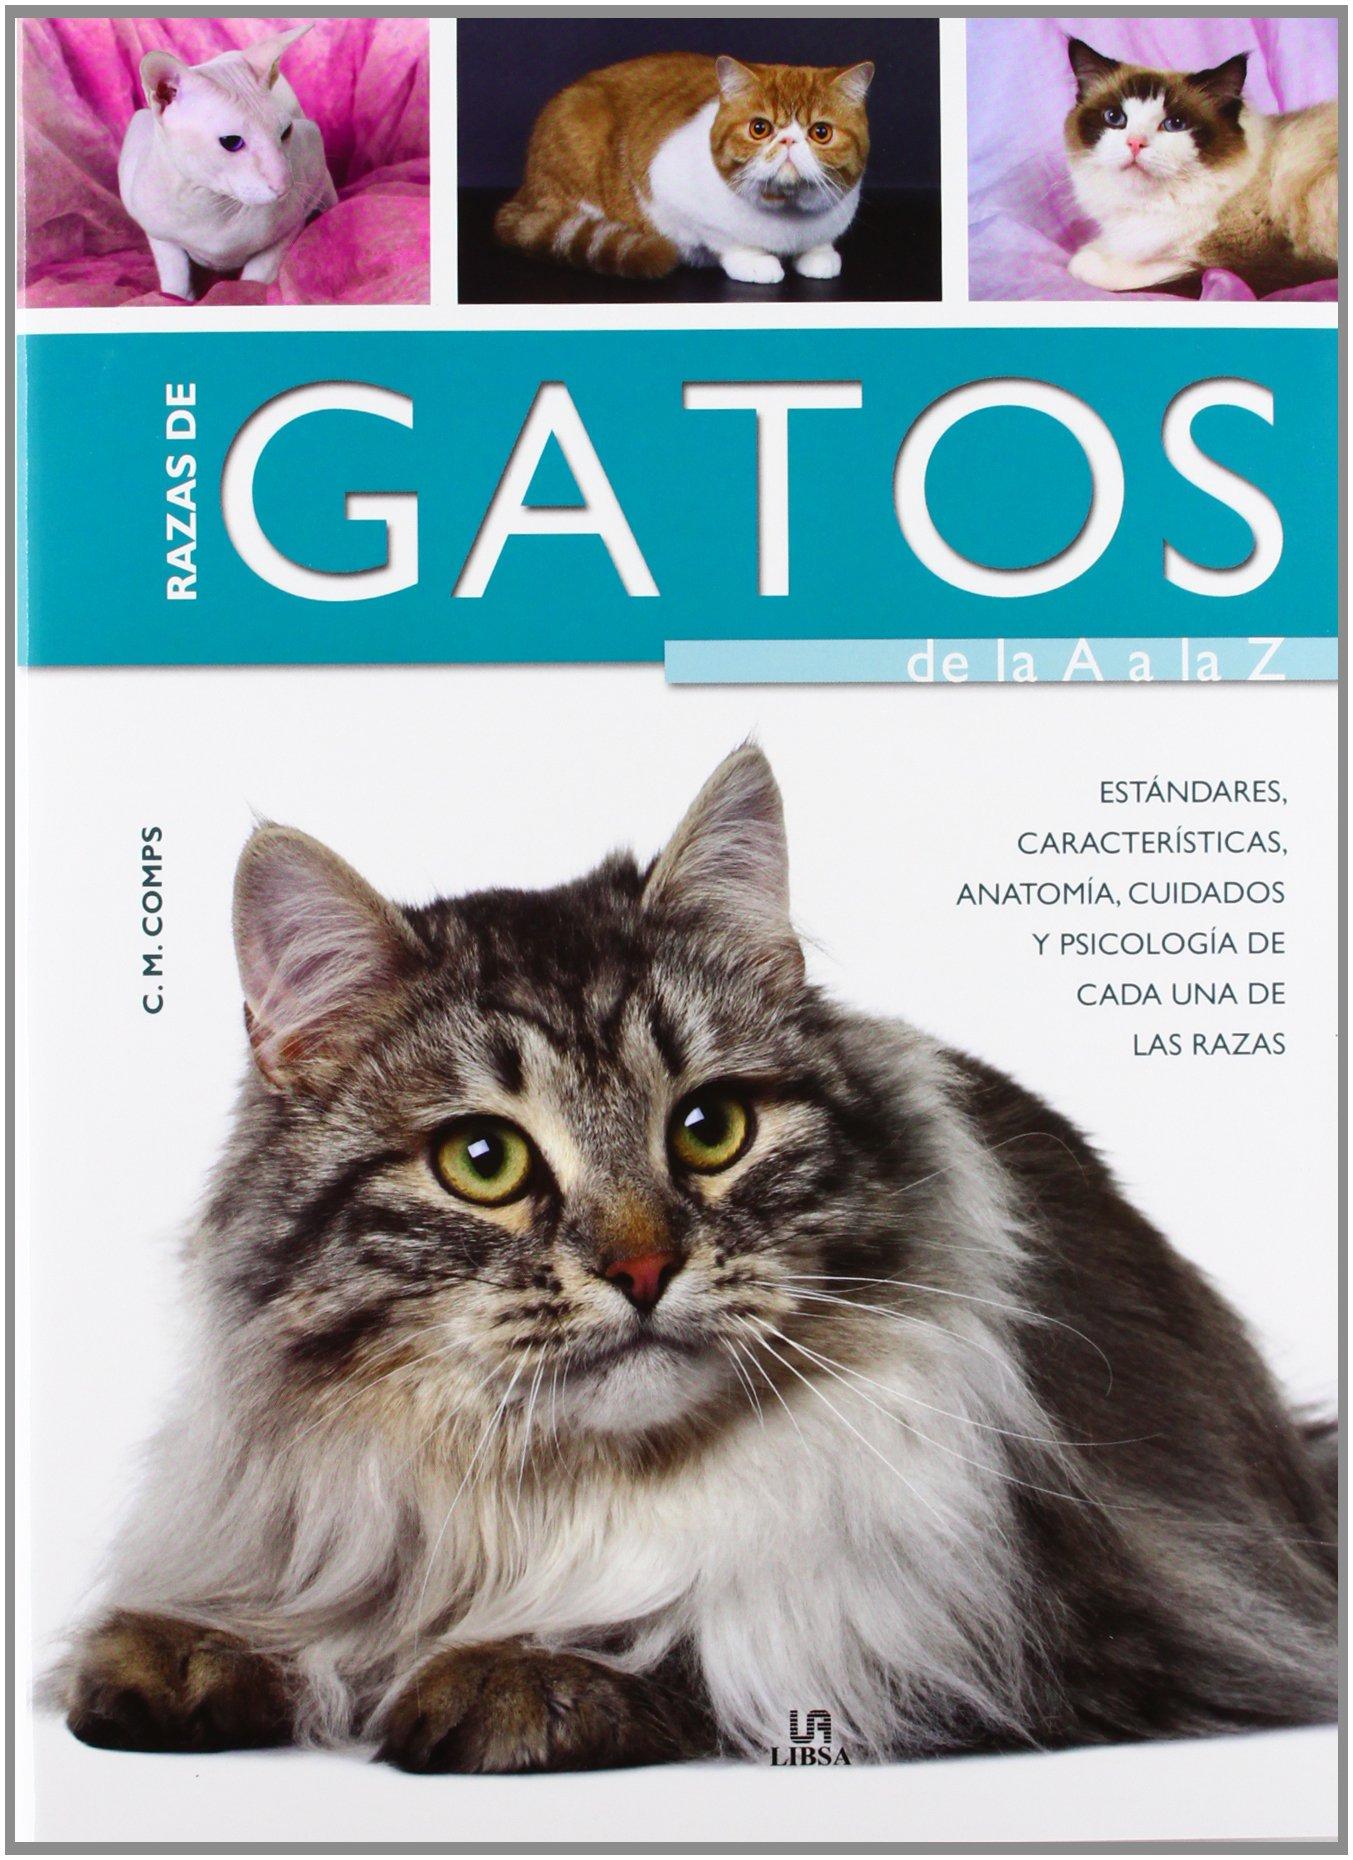 Razas de Gatos de la A a la Z: Características, Estándares ...